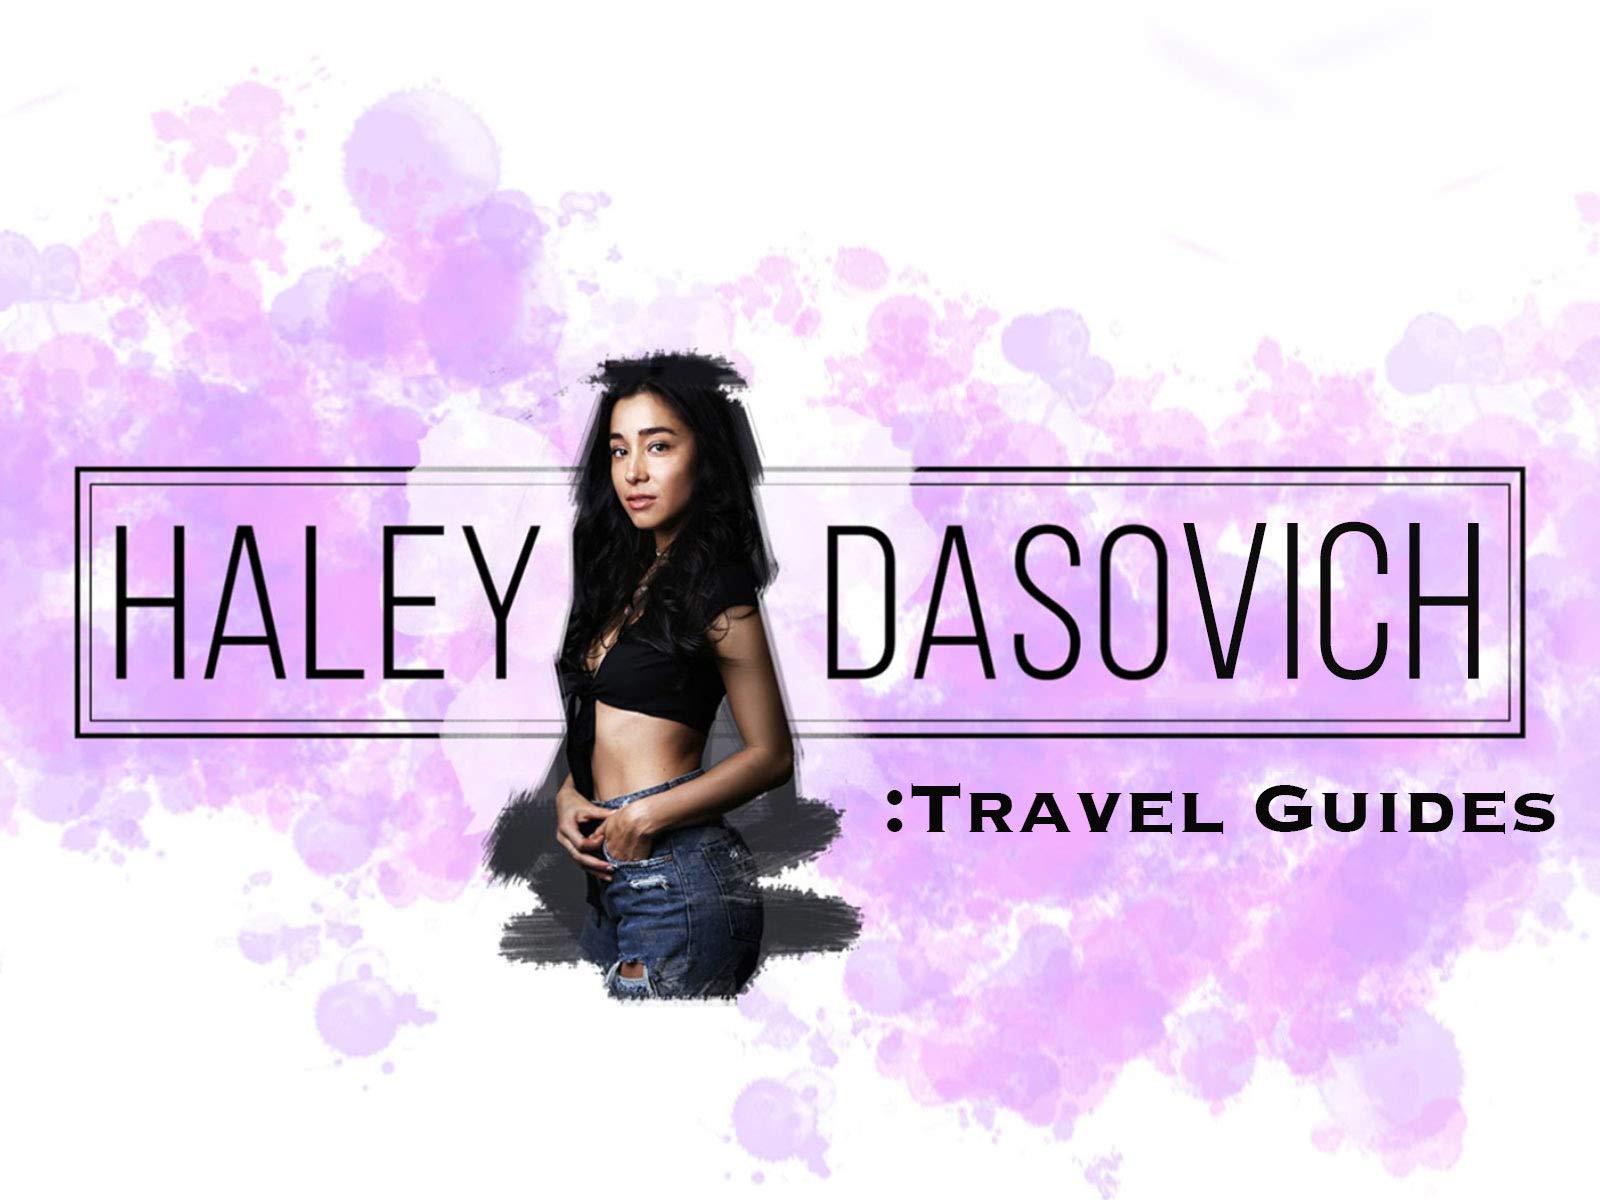 Haley Dasovich: Travel Guides - Season 1